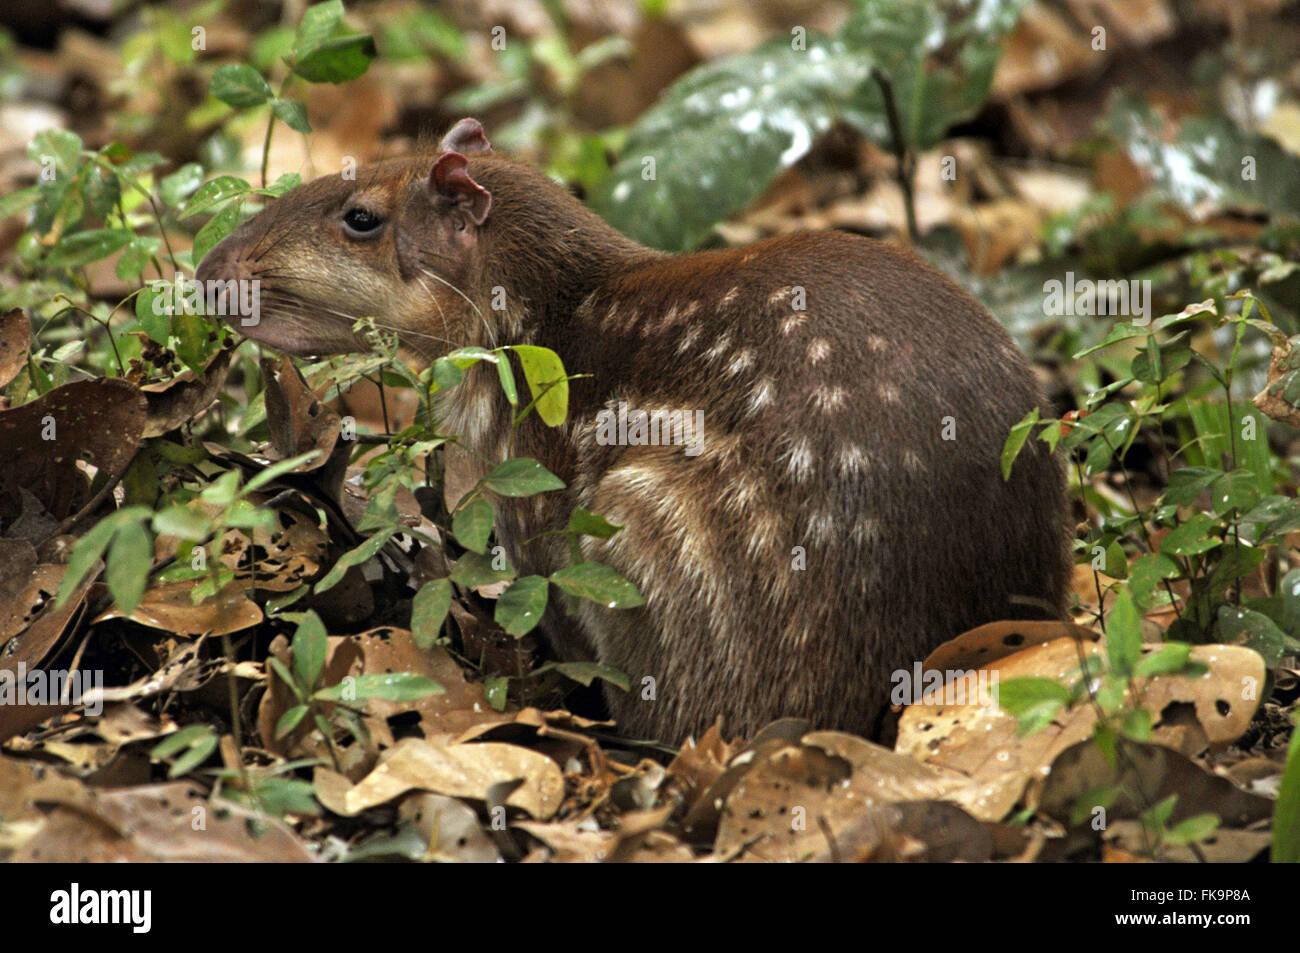 Paca in the Pantanal - cuniculus paca - Stock Image